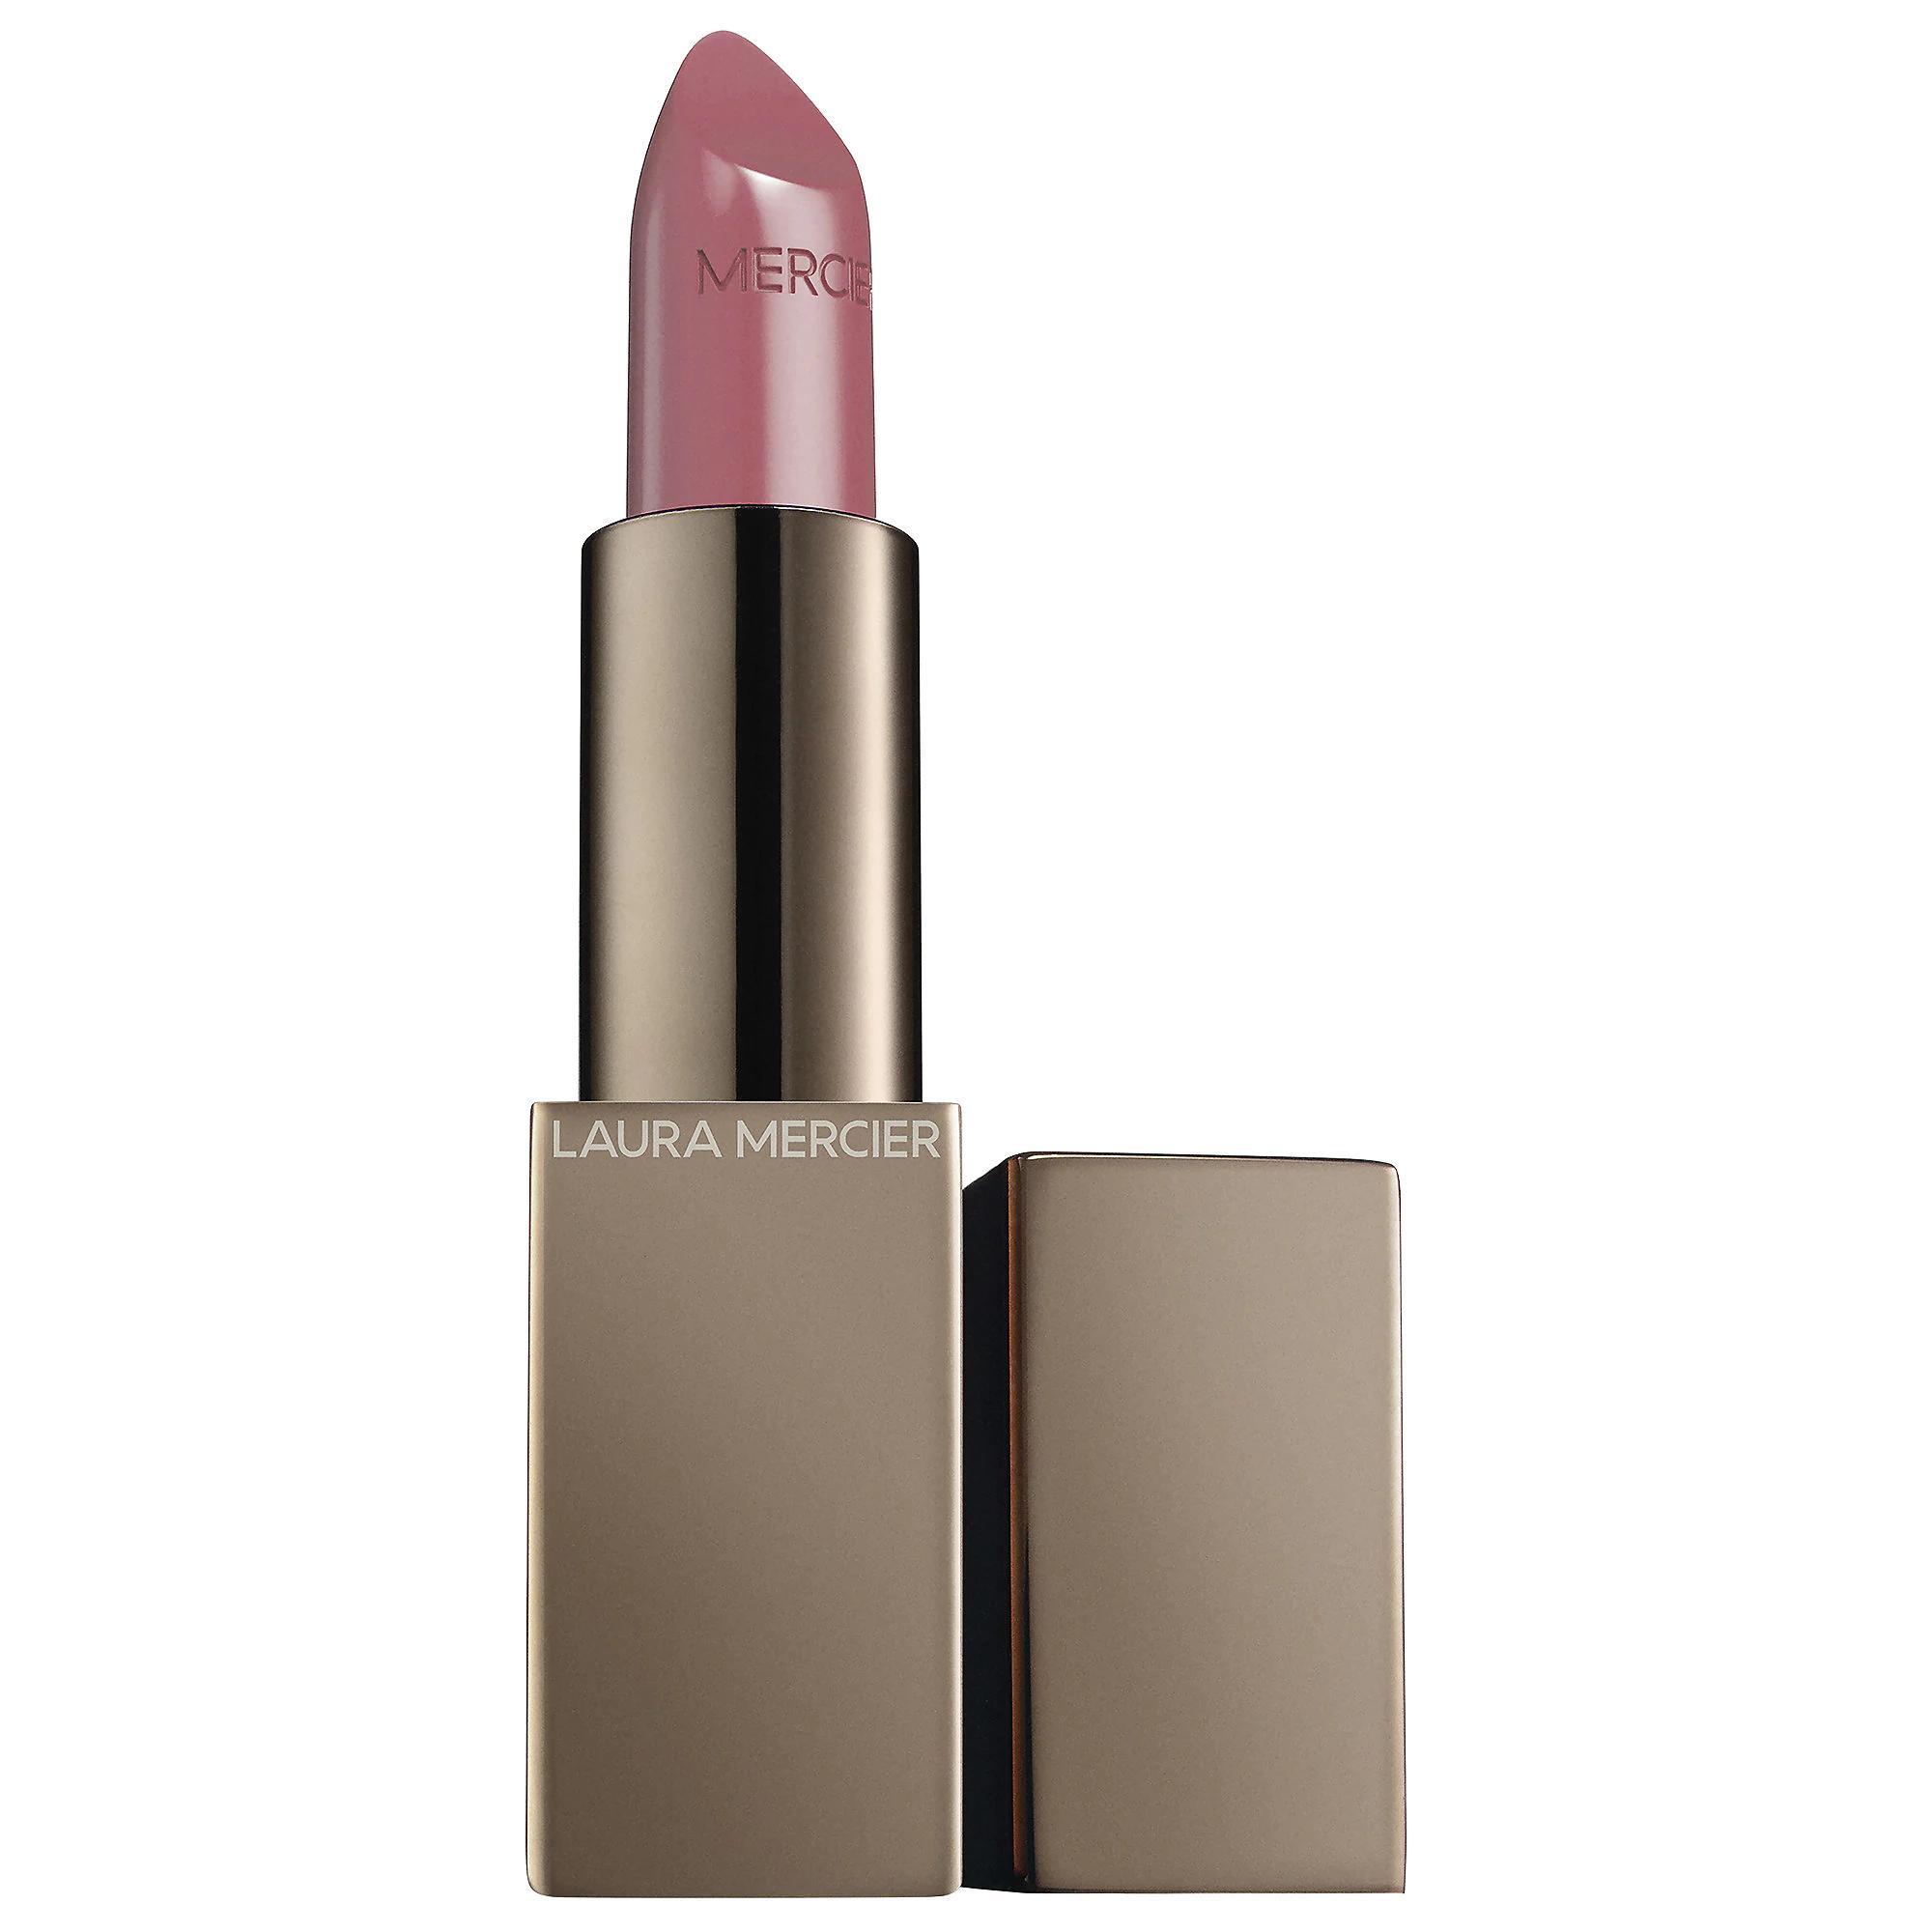 Laura Mercier Rouge Essentiel Silky Creme Lipstick A La Rose